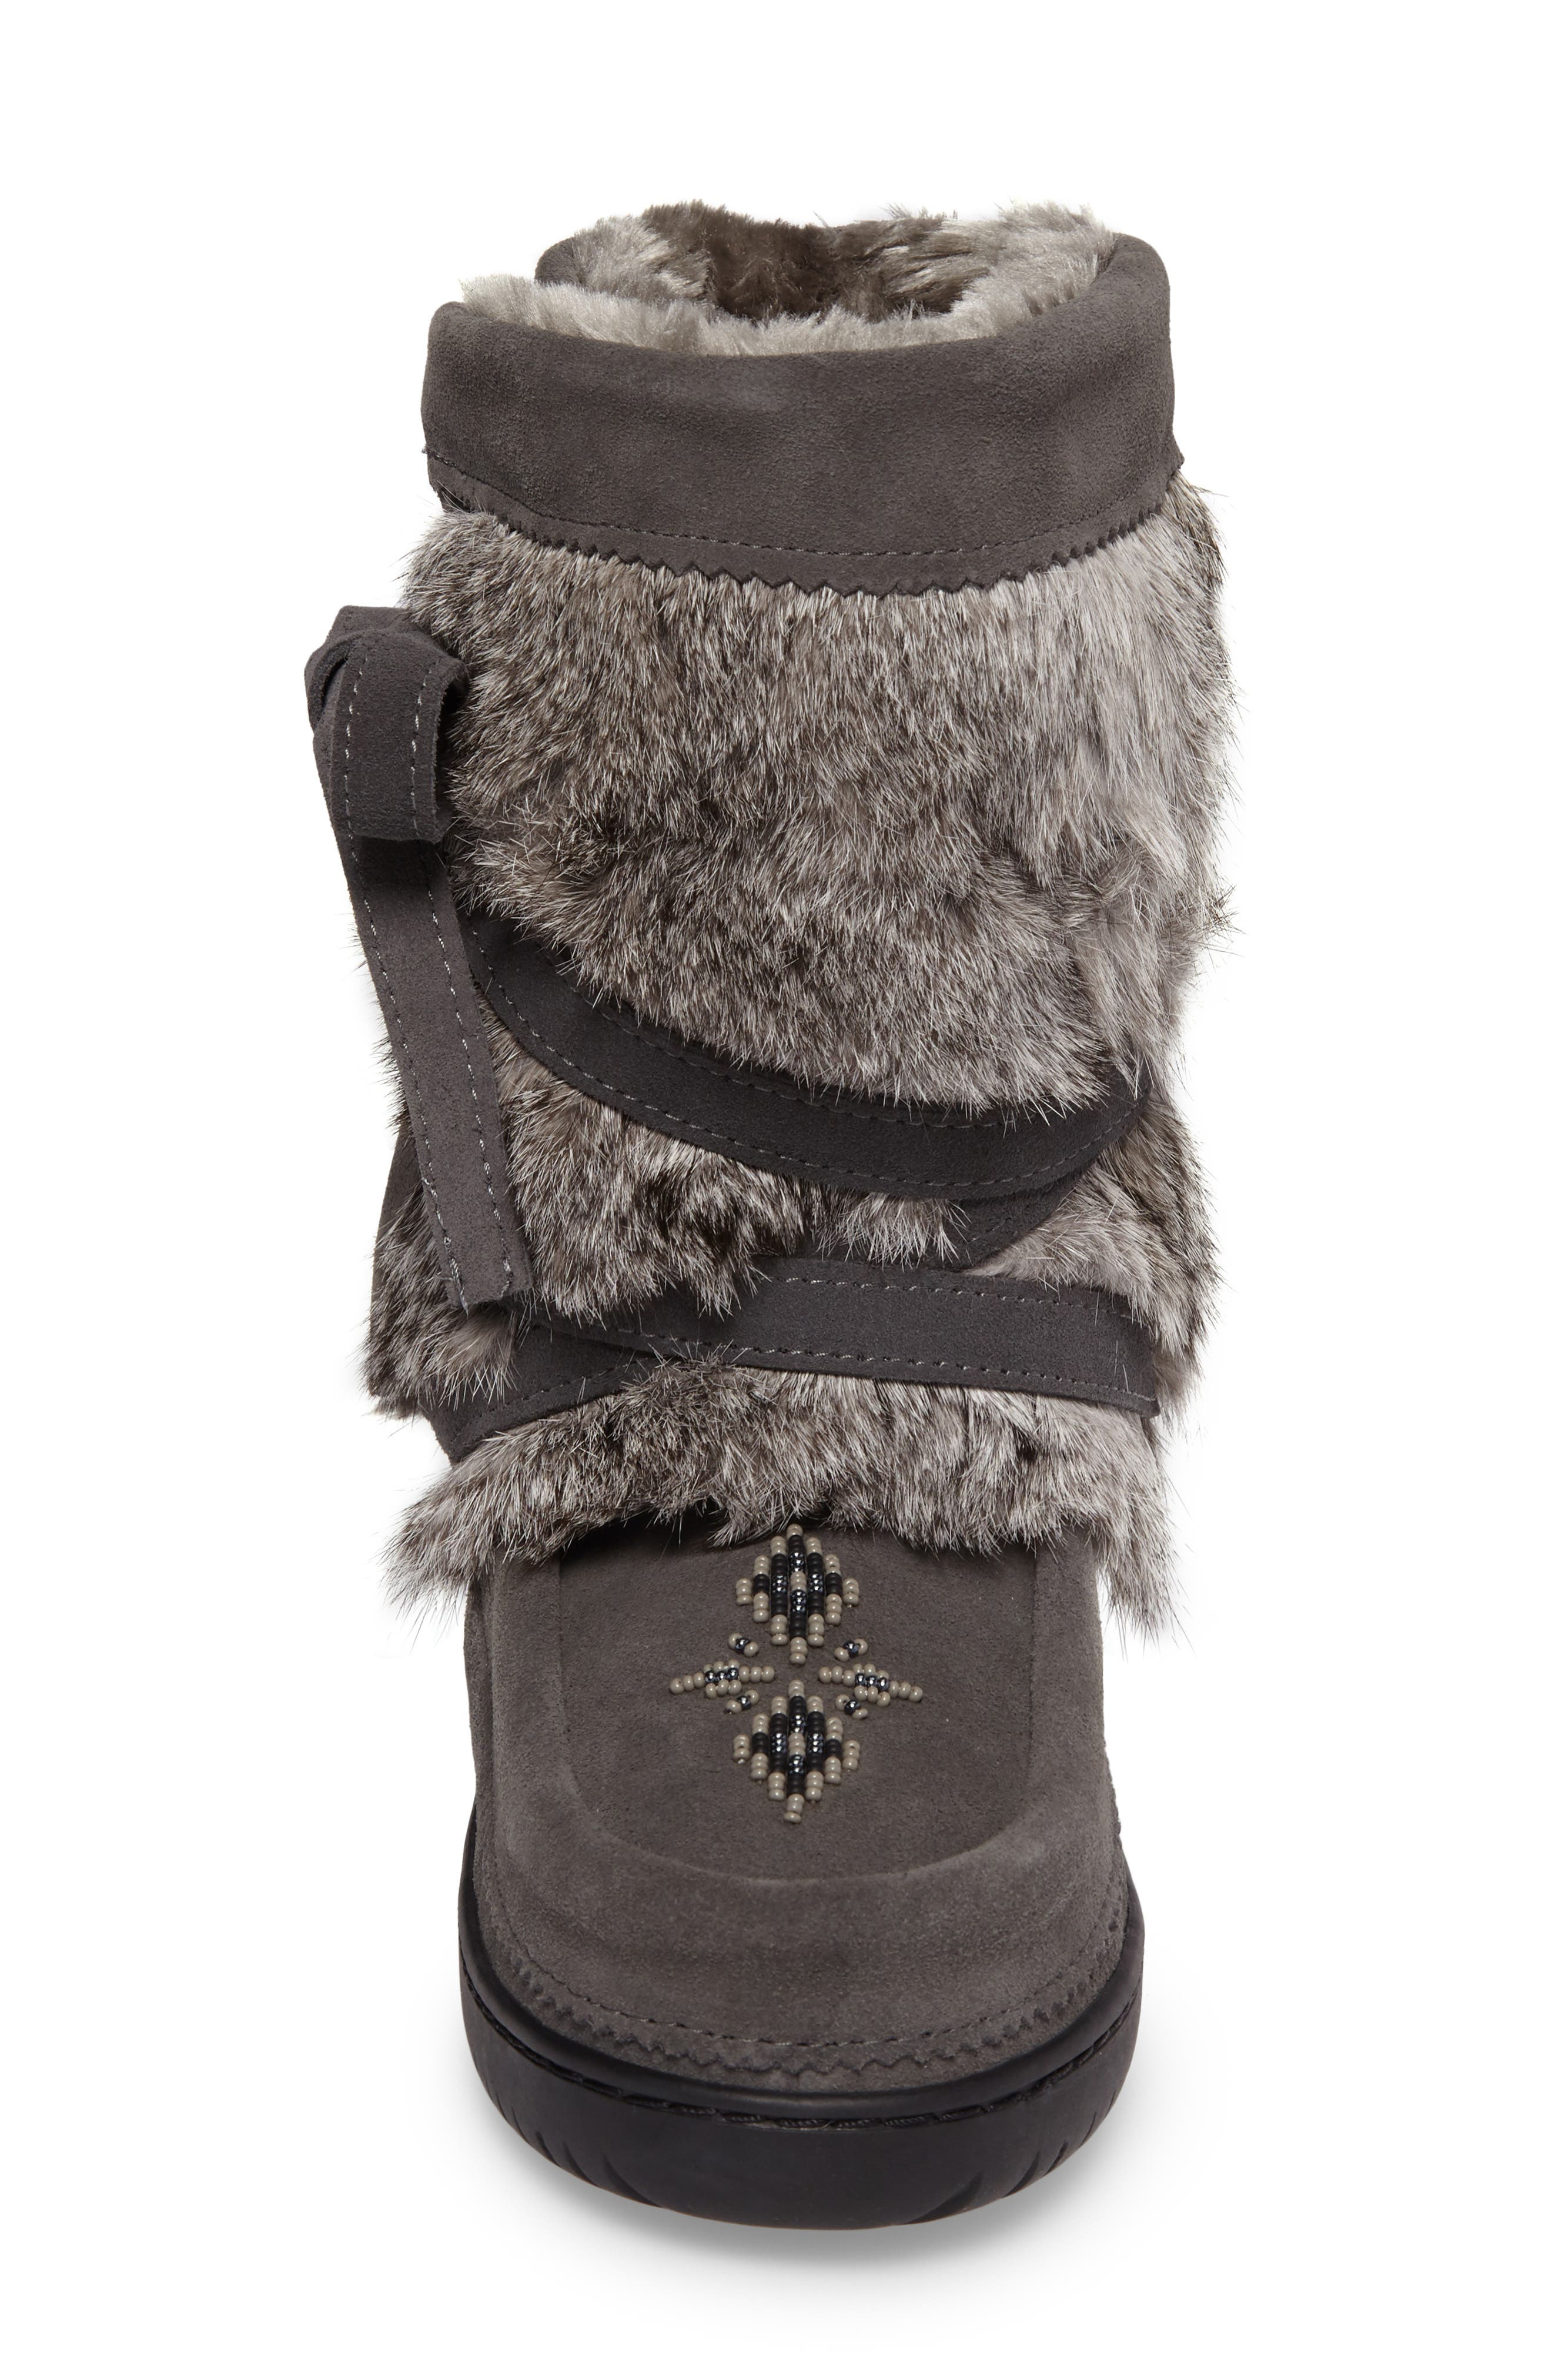 Beaded Short Wrap Genuine Rabbit Fur & Shearling Boot,                             Alternate thumbnail 4, color,                             CHARCOAL FUR